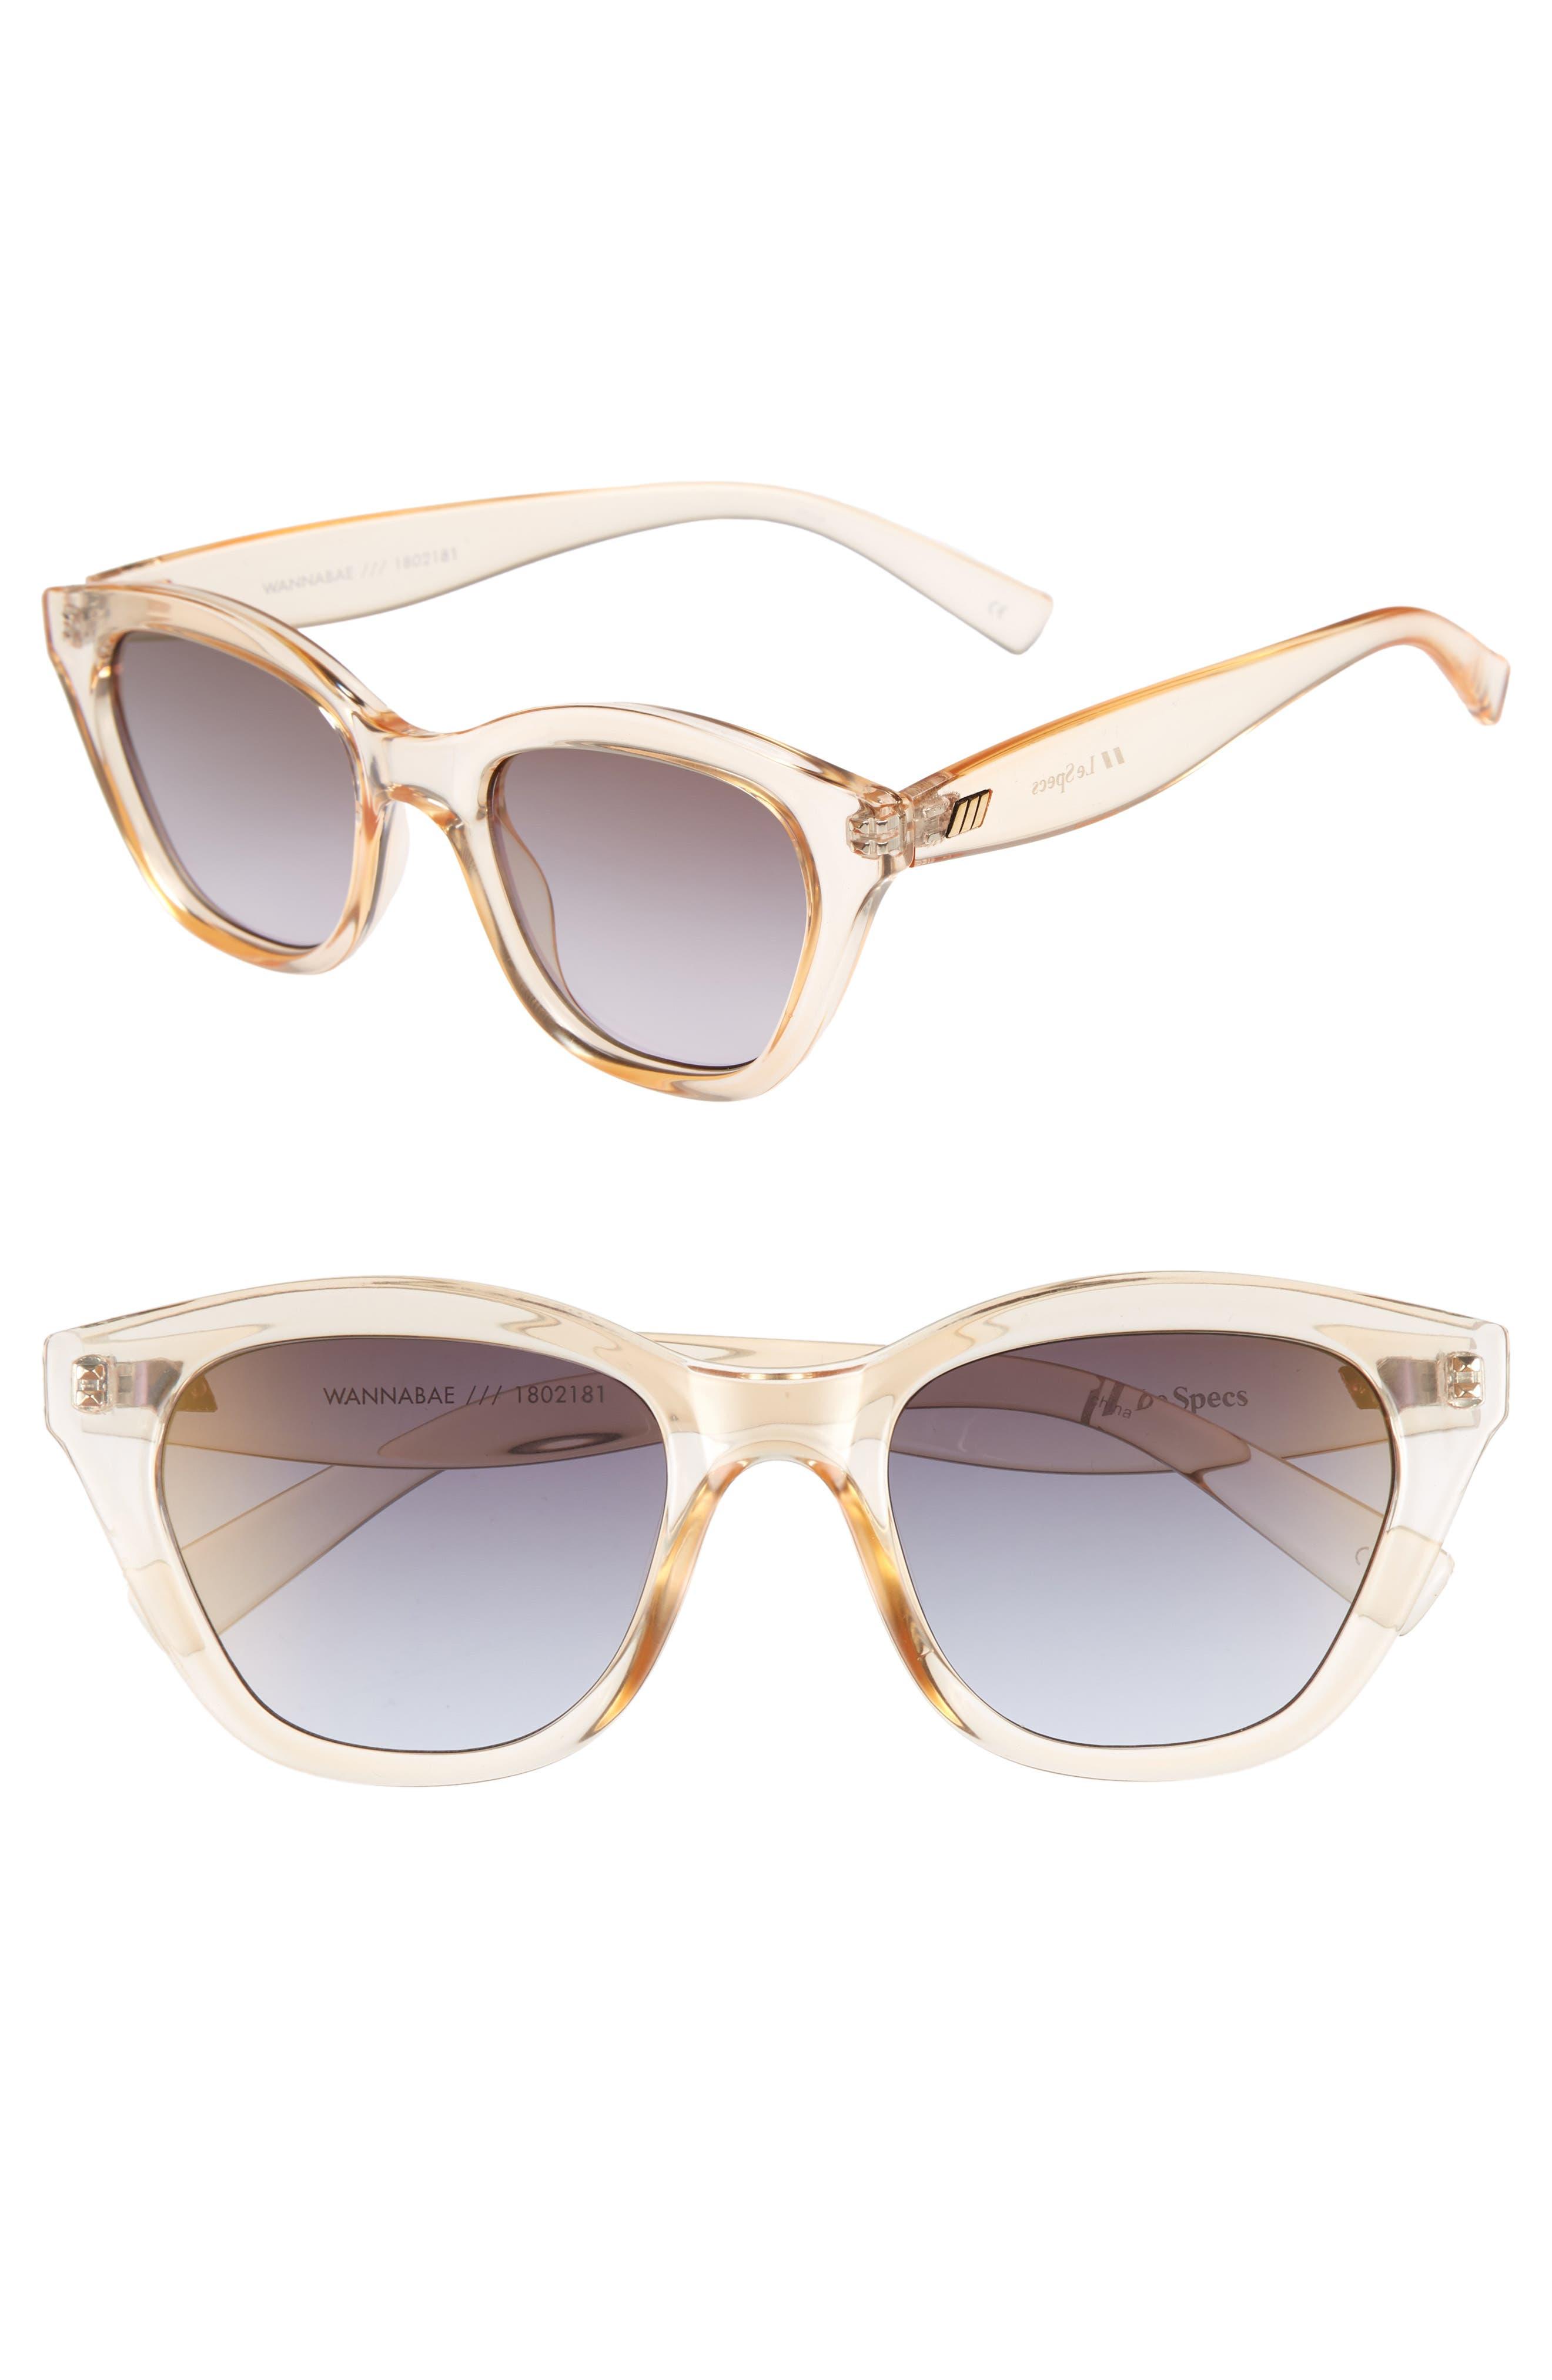 Wannabae 49mm Angular Sunglasses,                         Main,                         color, Blonde